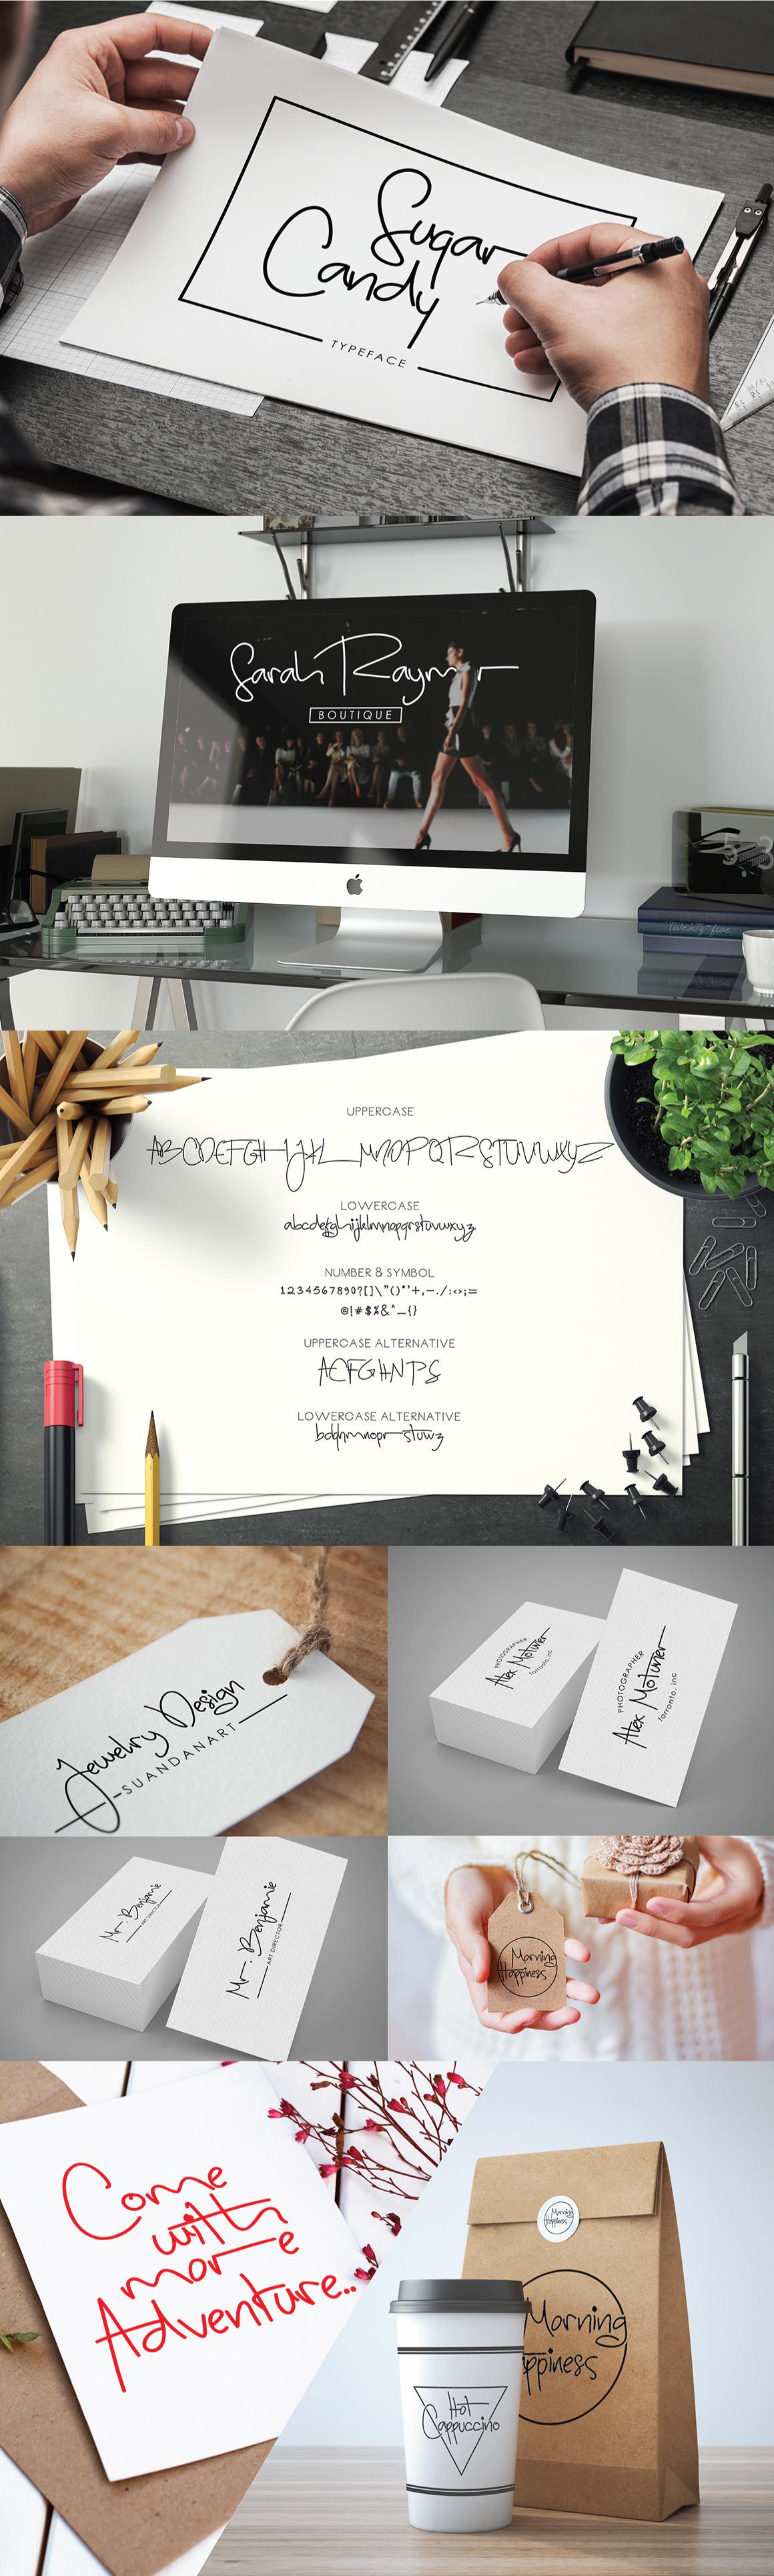 Free font free fonts freebie freebies free signature font Typeface logo hand drawn